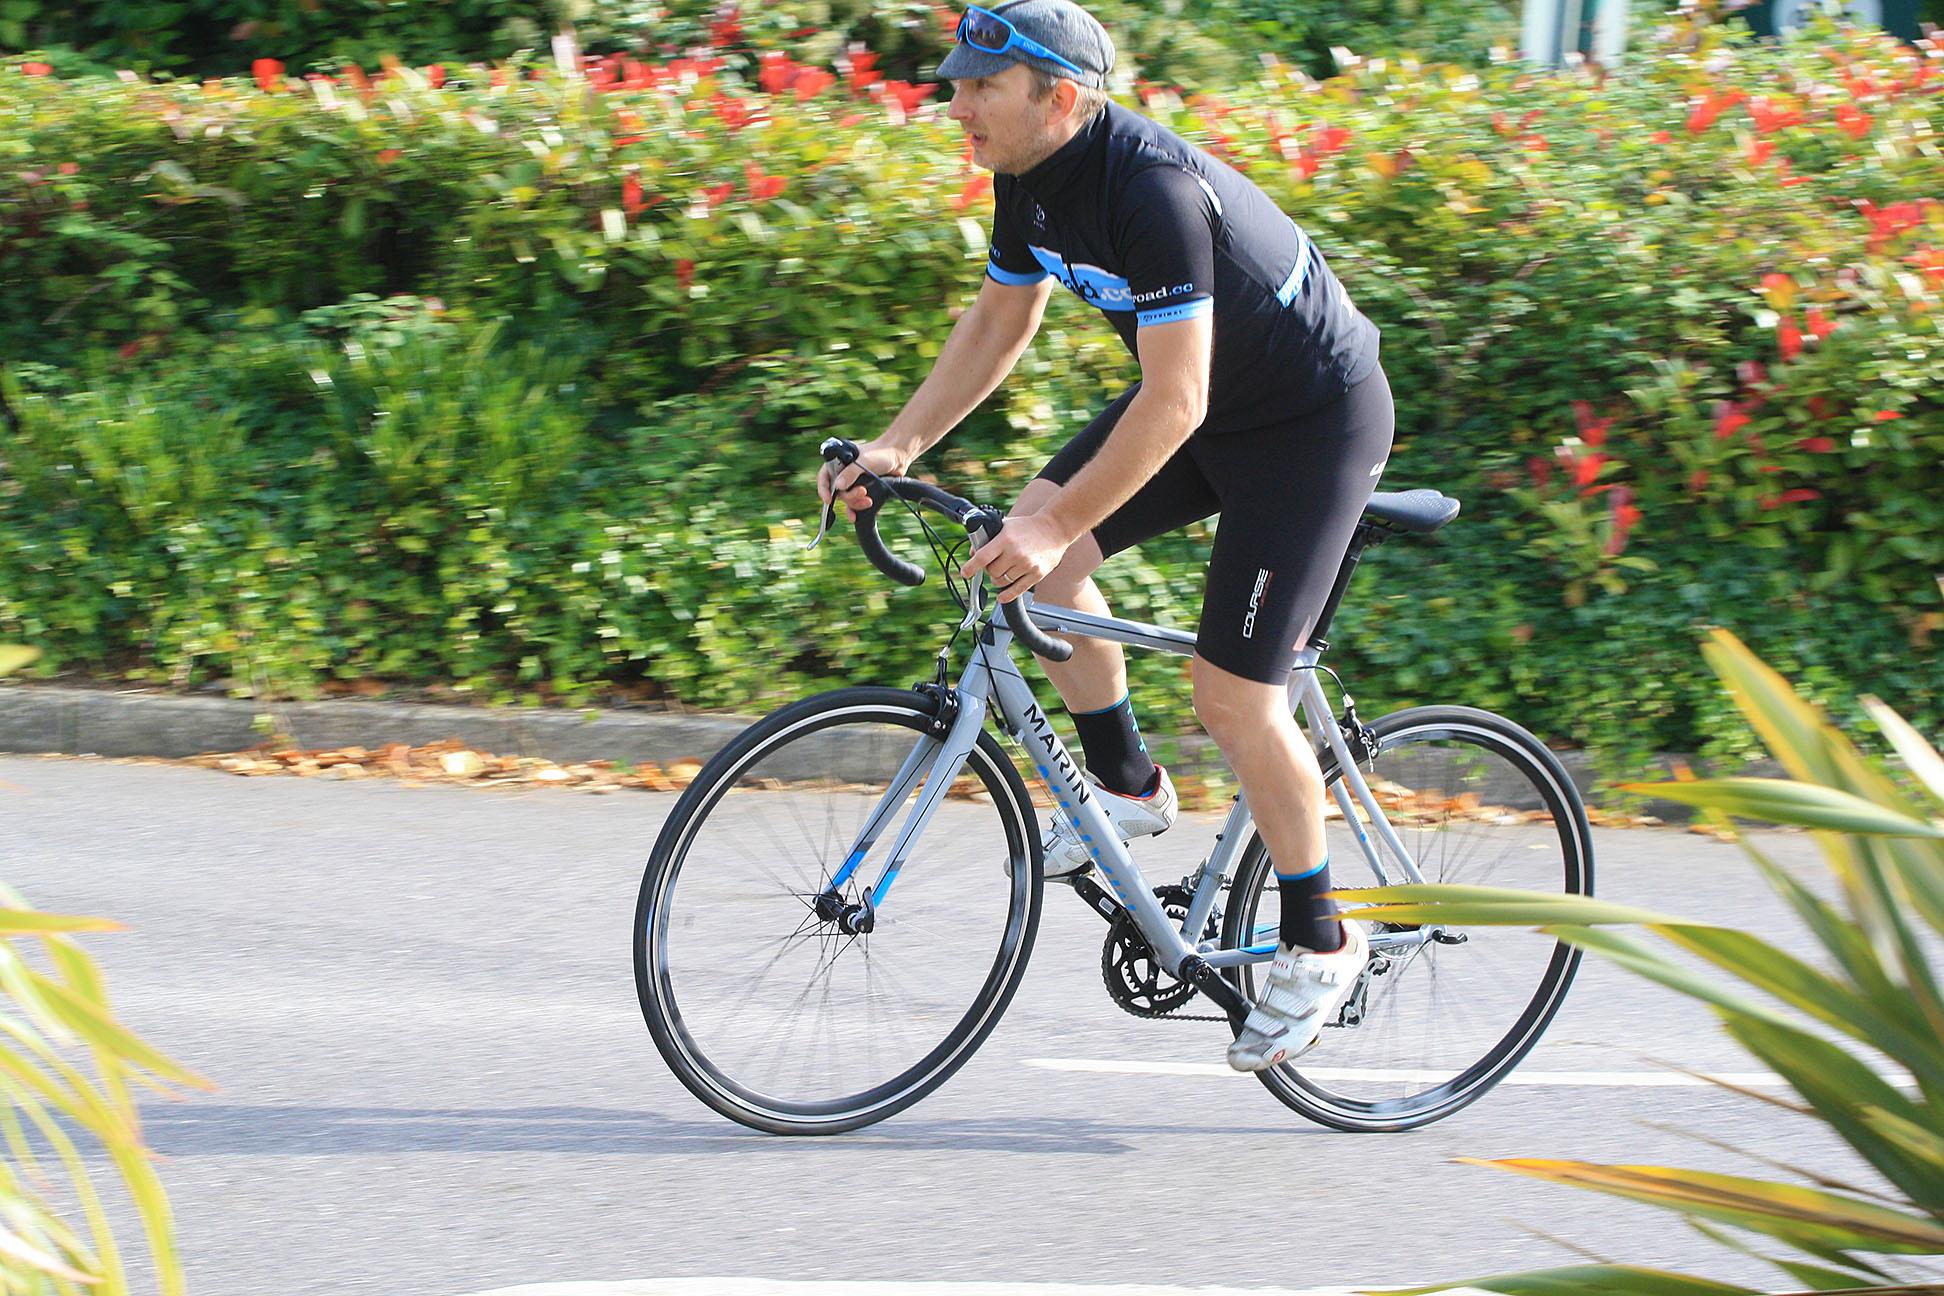 2017 Marin Argenta Elite 700 C 6061 Aluminium Lightweigt Fitness//cadre de vélo de route NEUF